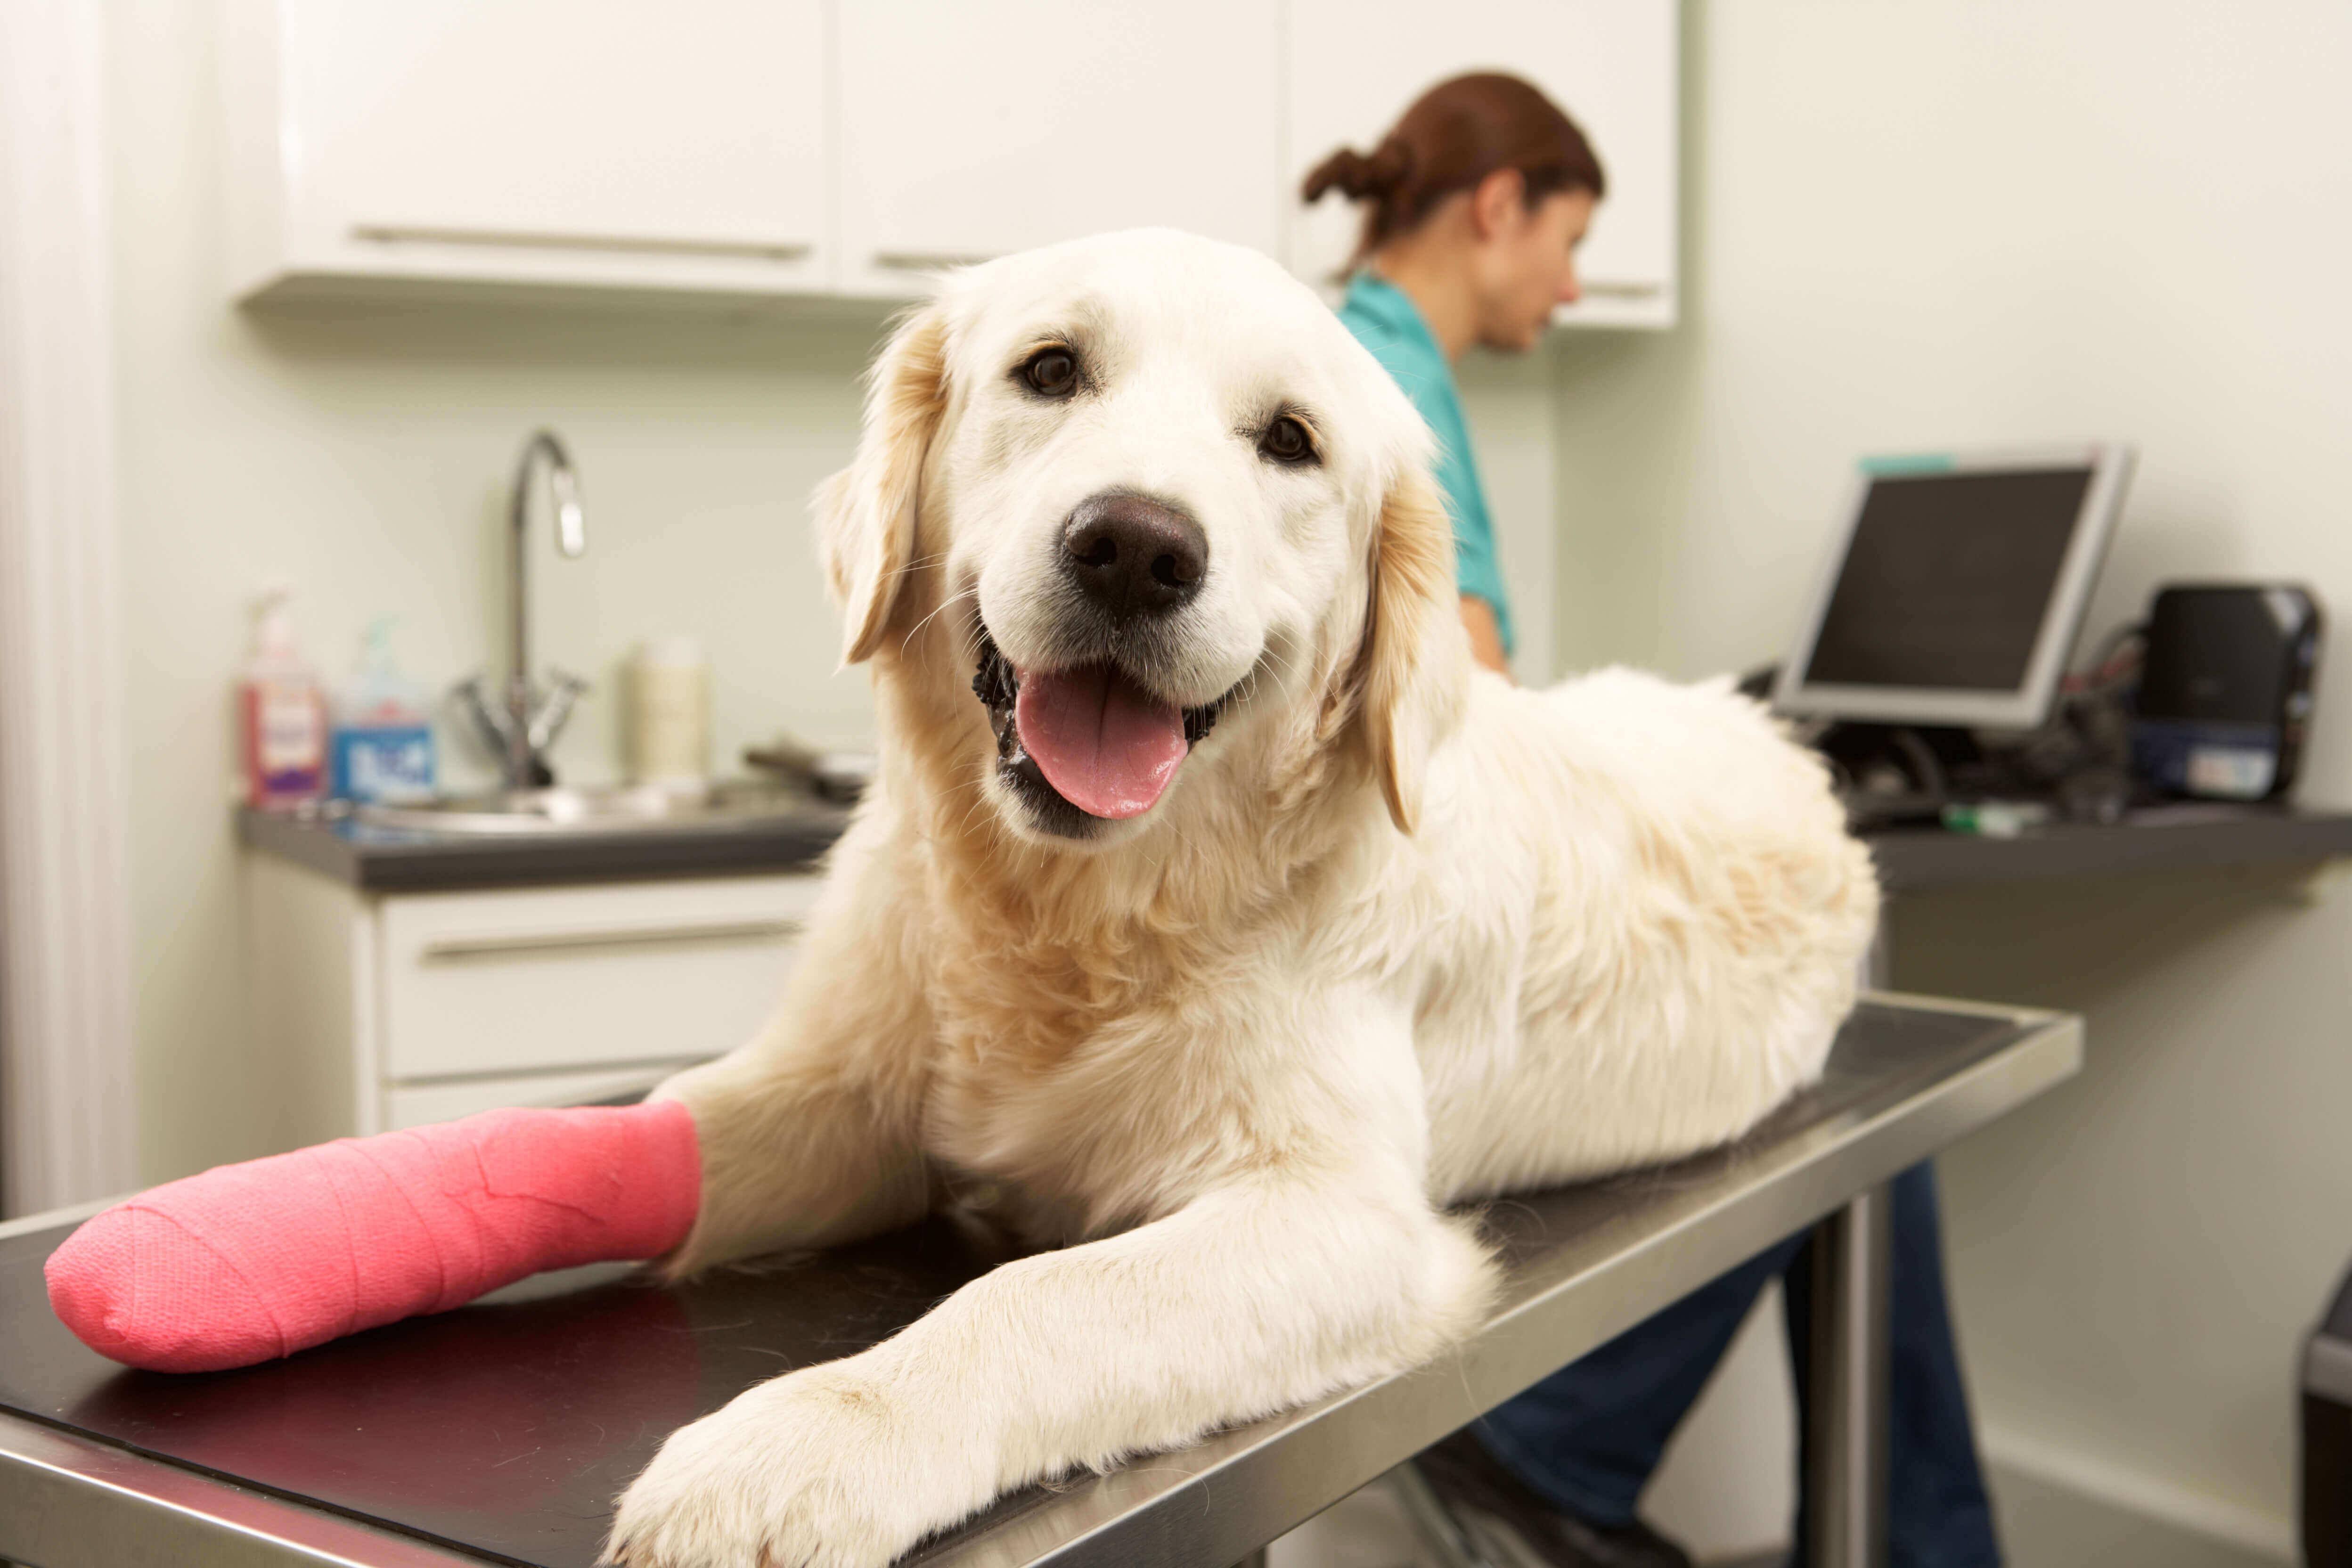 Manie e disturbi compulsivi nei cani